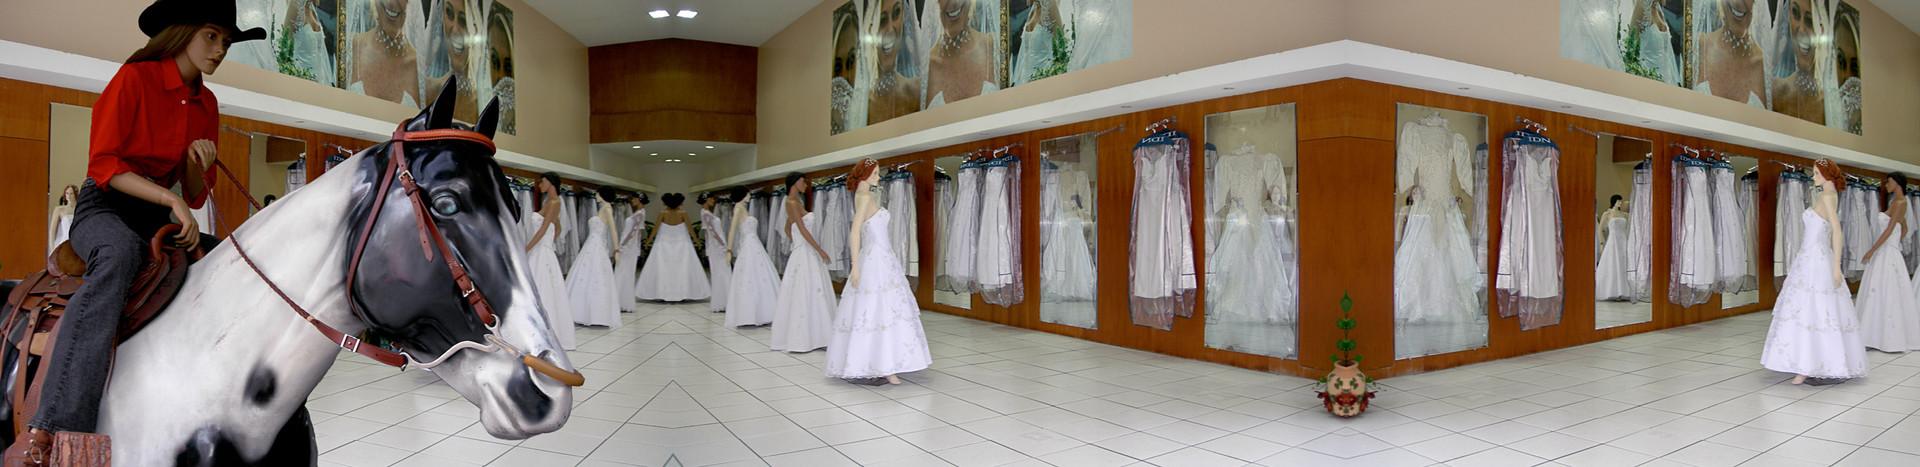 0180.Headless Brides01, 2008